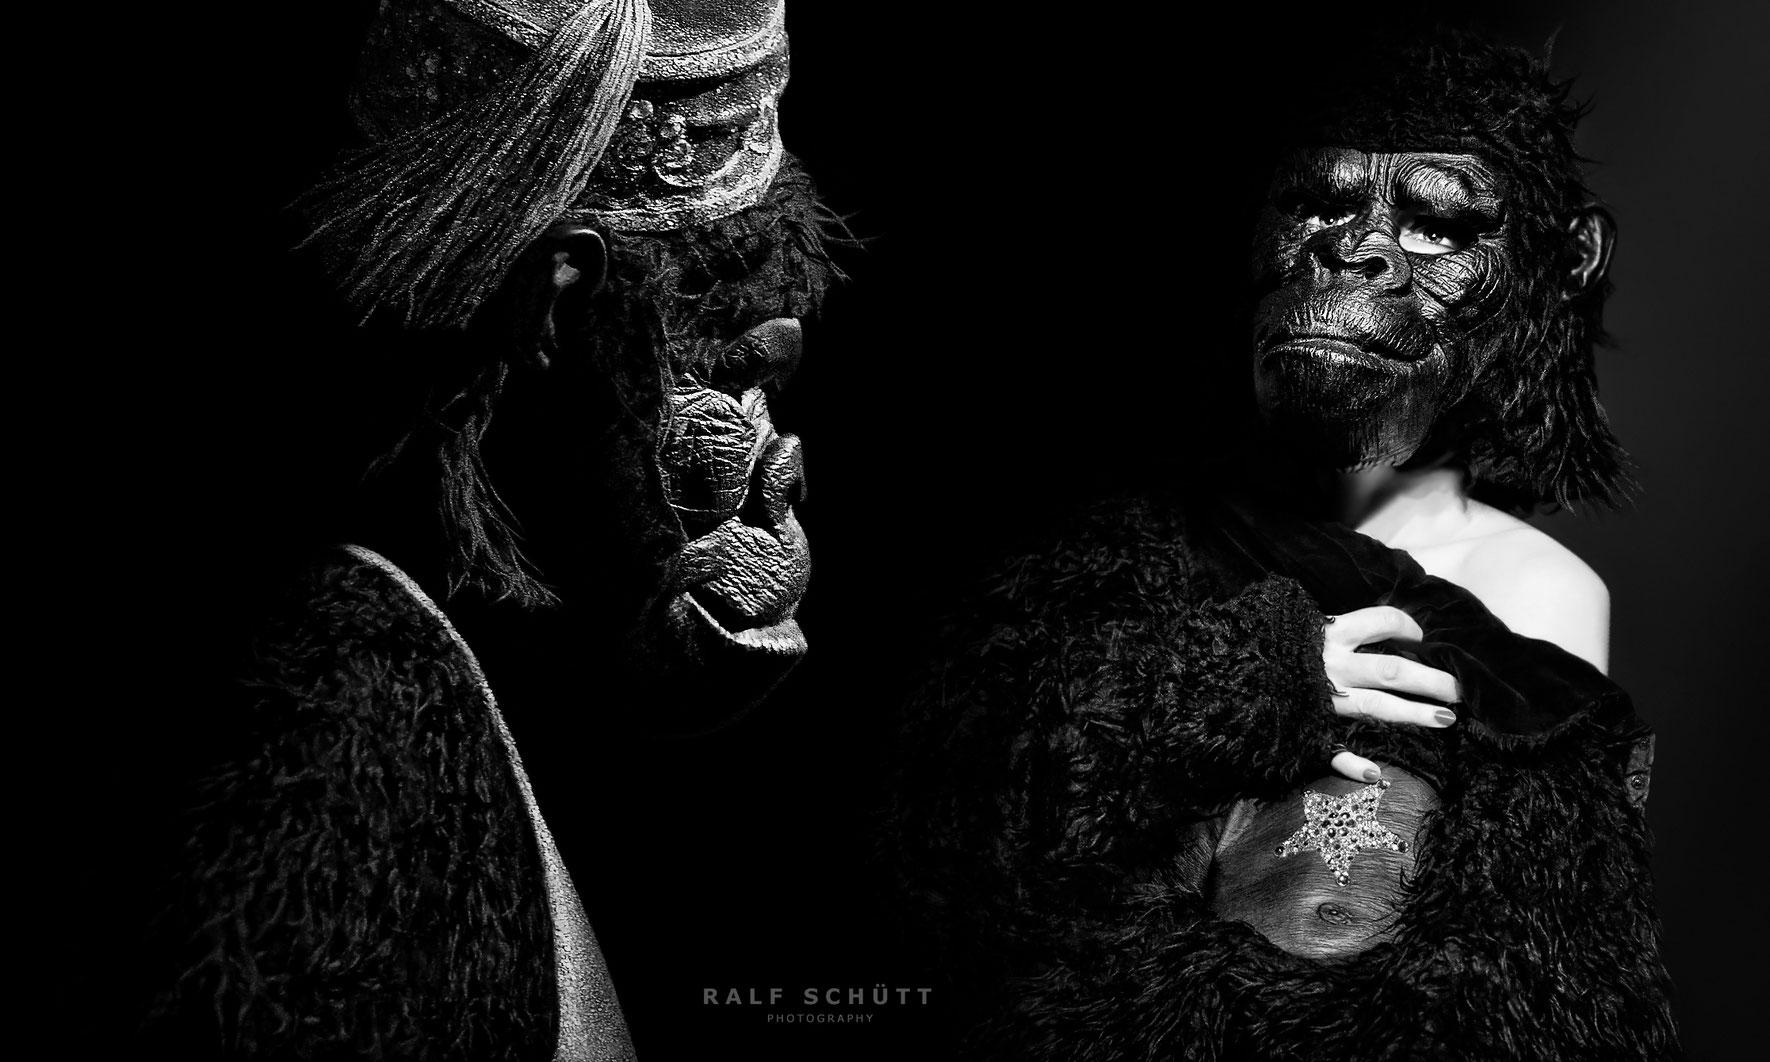 Petula Goldfever - 'Gorilla' © Ralf Schütt Photography